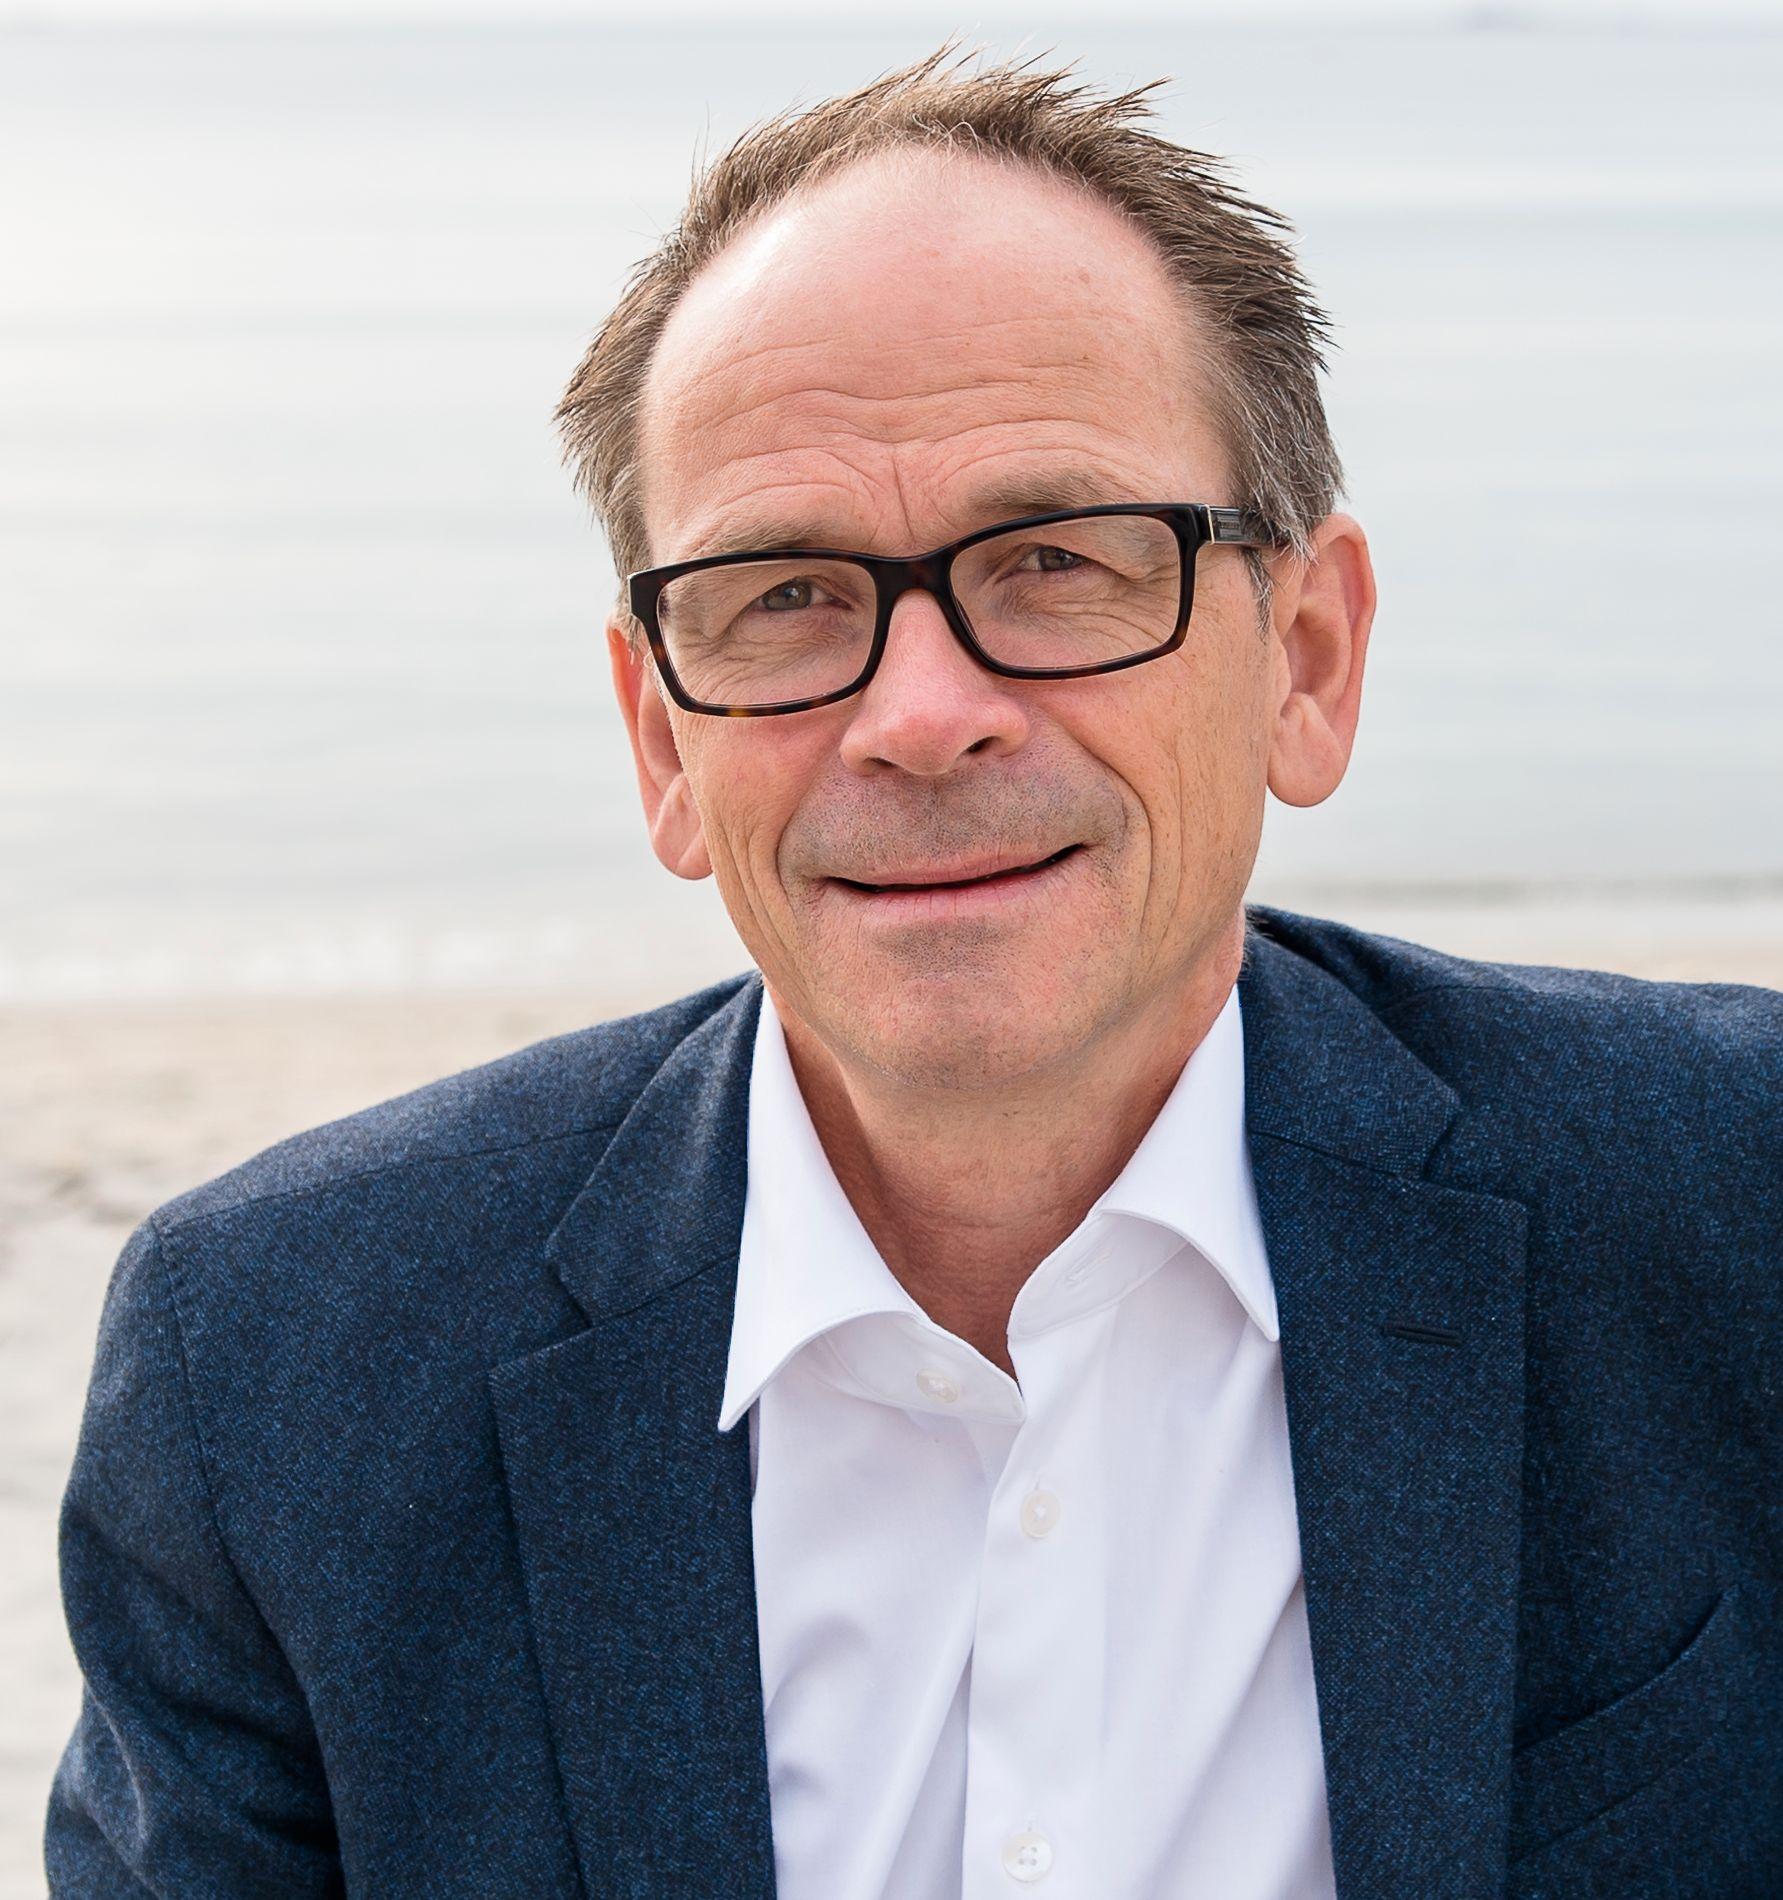 Lars Petter Maltby